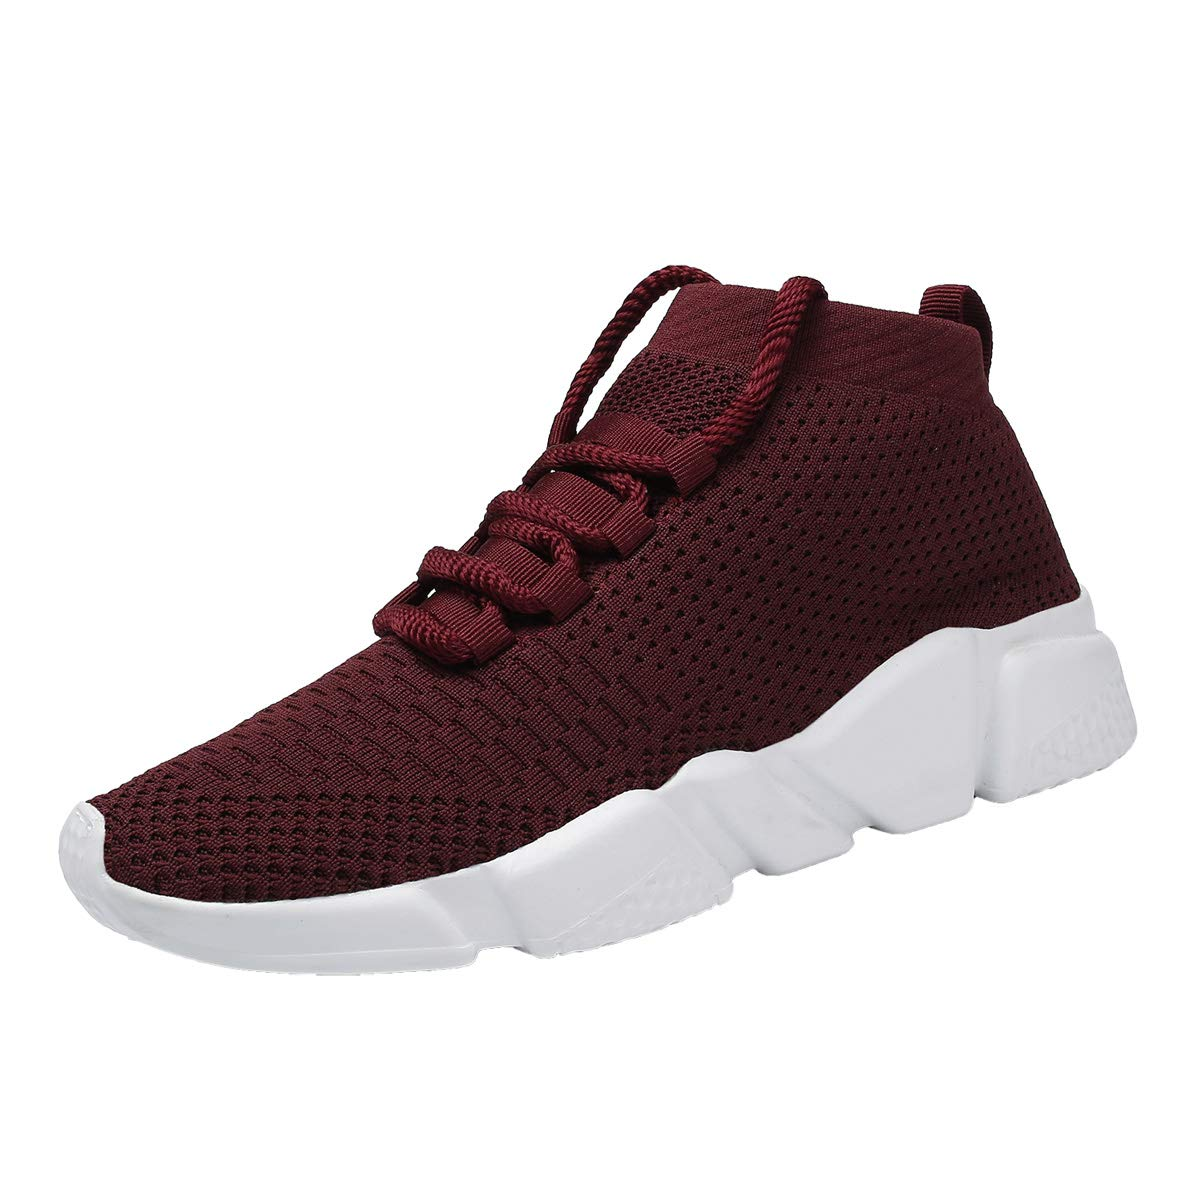 Kundork Womens Casual Athletic Sneakers Knit Running Shoes Tennis Shoe for Women Walking Baseball Jogging Training Gym Kundork801W